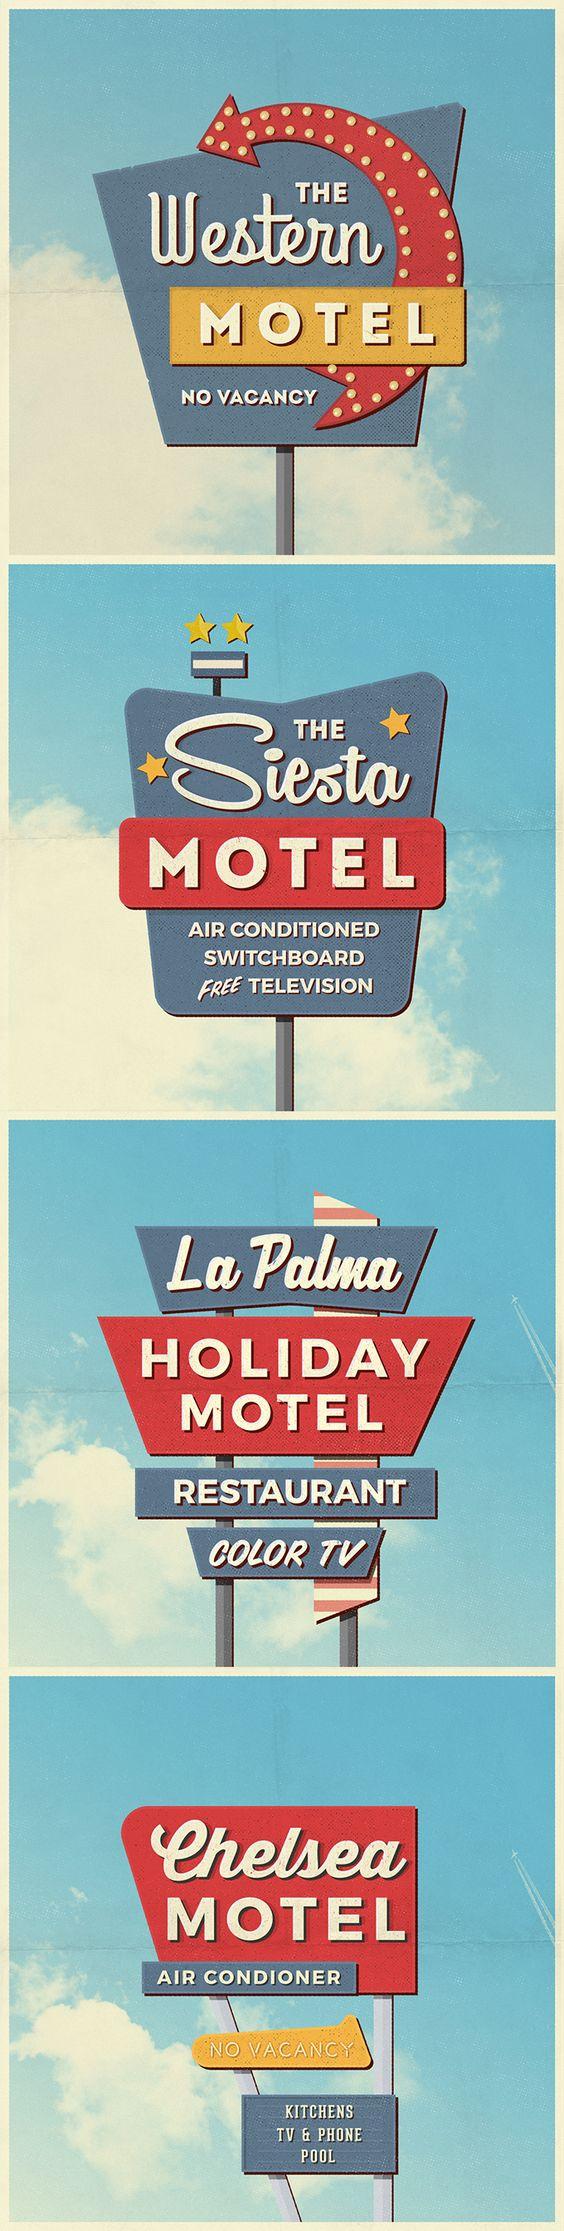 vintage motel sign mockups pin vintage and signs 4 vintage motel sign mockups 226 mb by antonio padilla on pixelbuddha